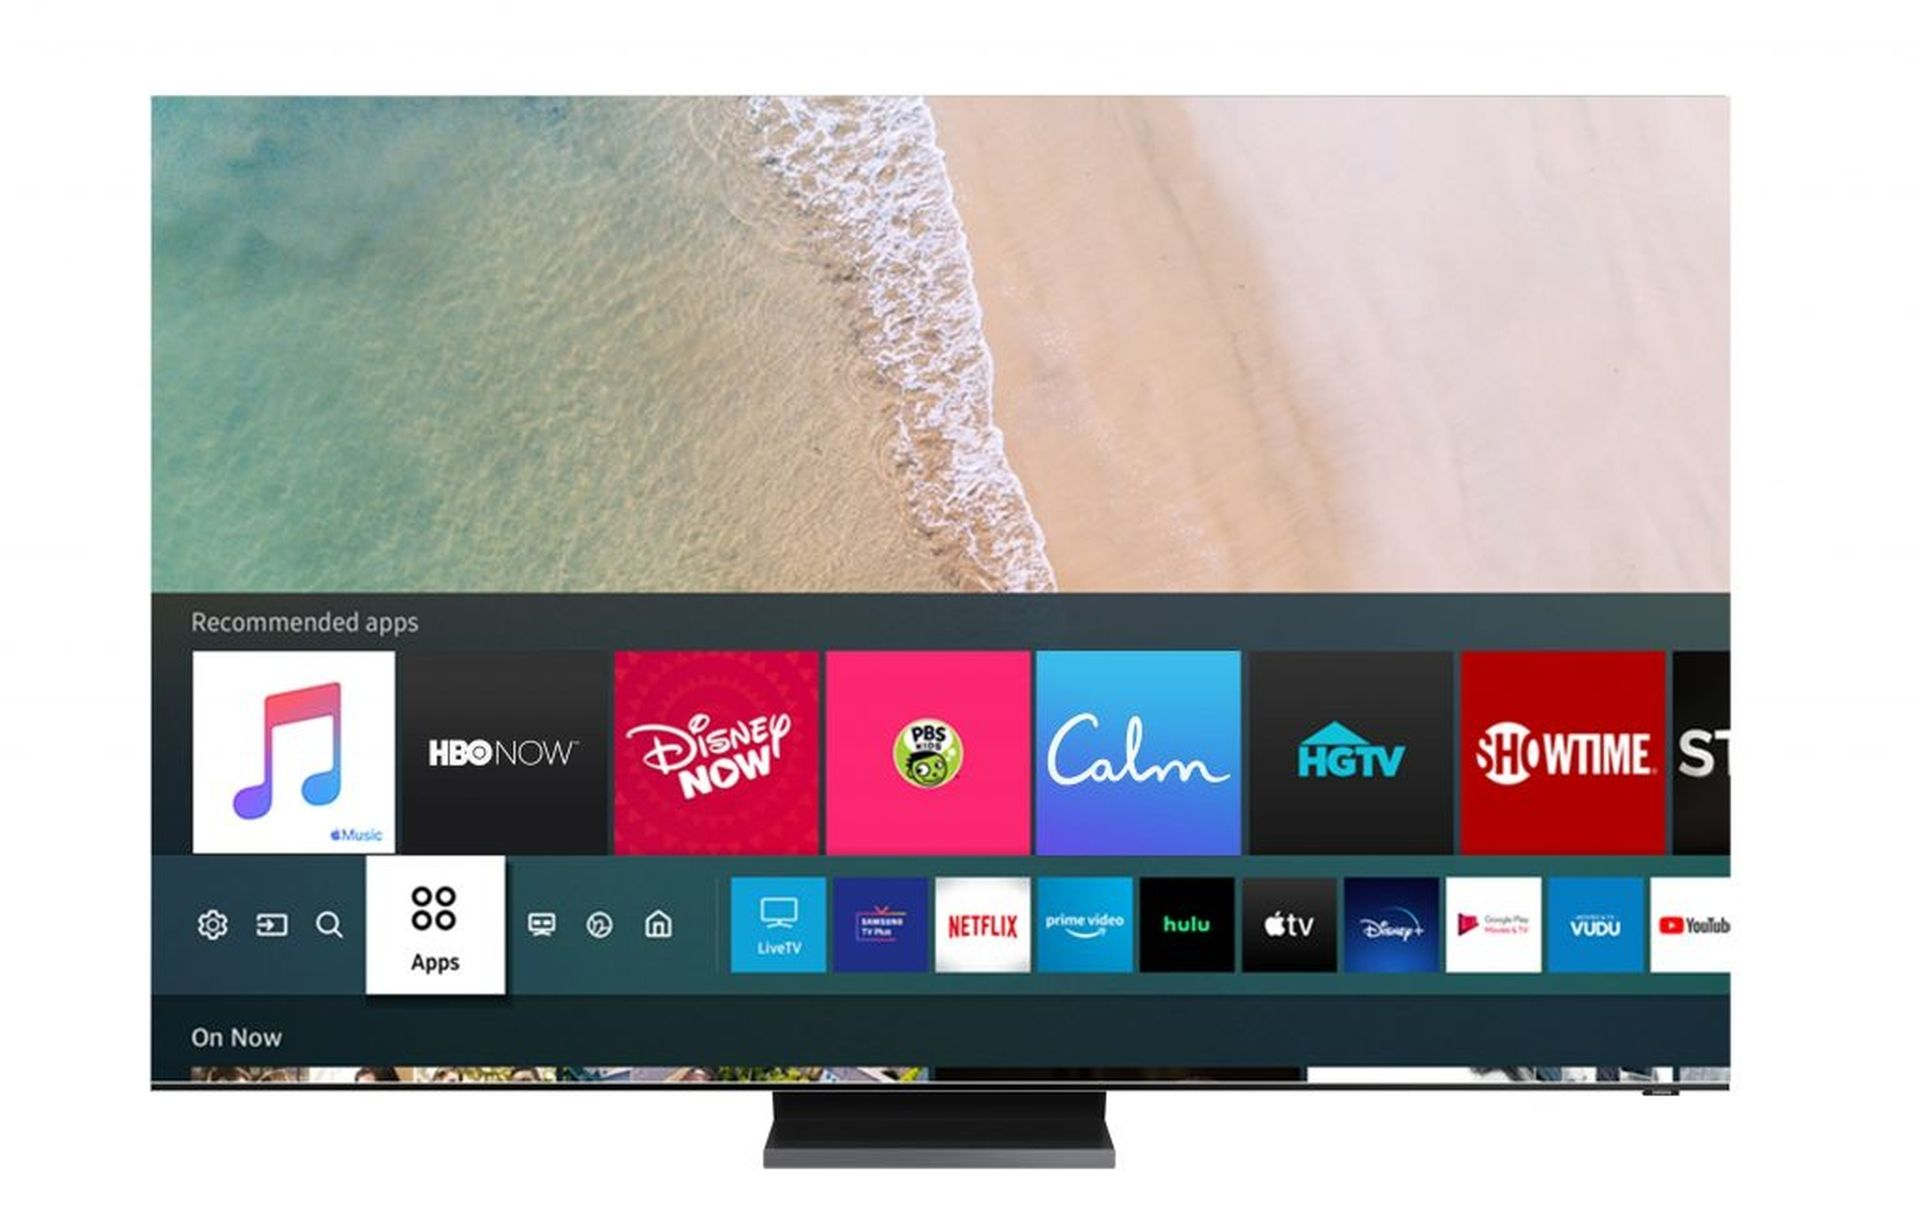 Aplikacja Apple Music dostępna na smart telewizorach Samsunga